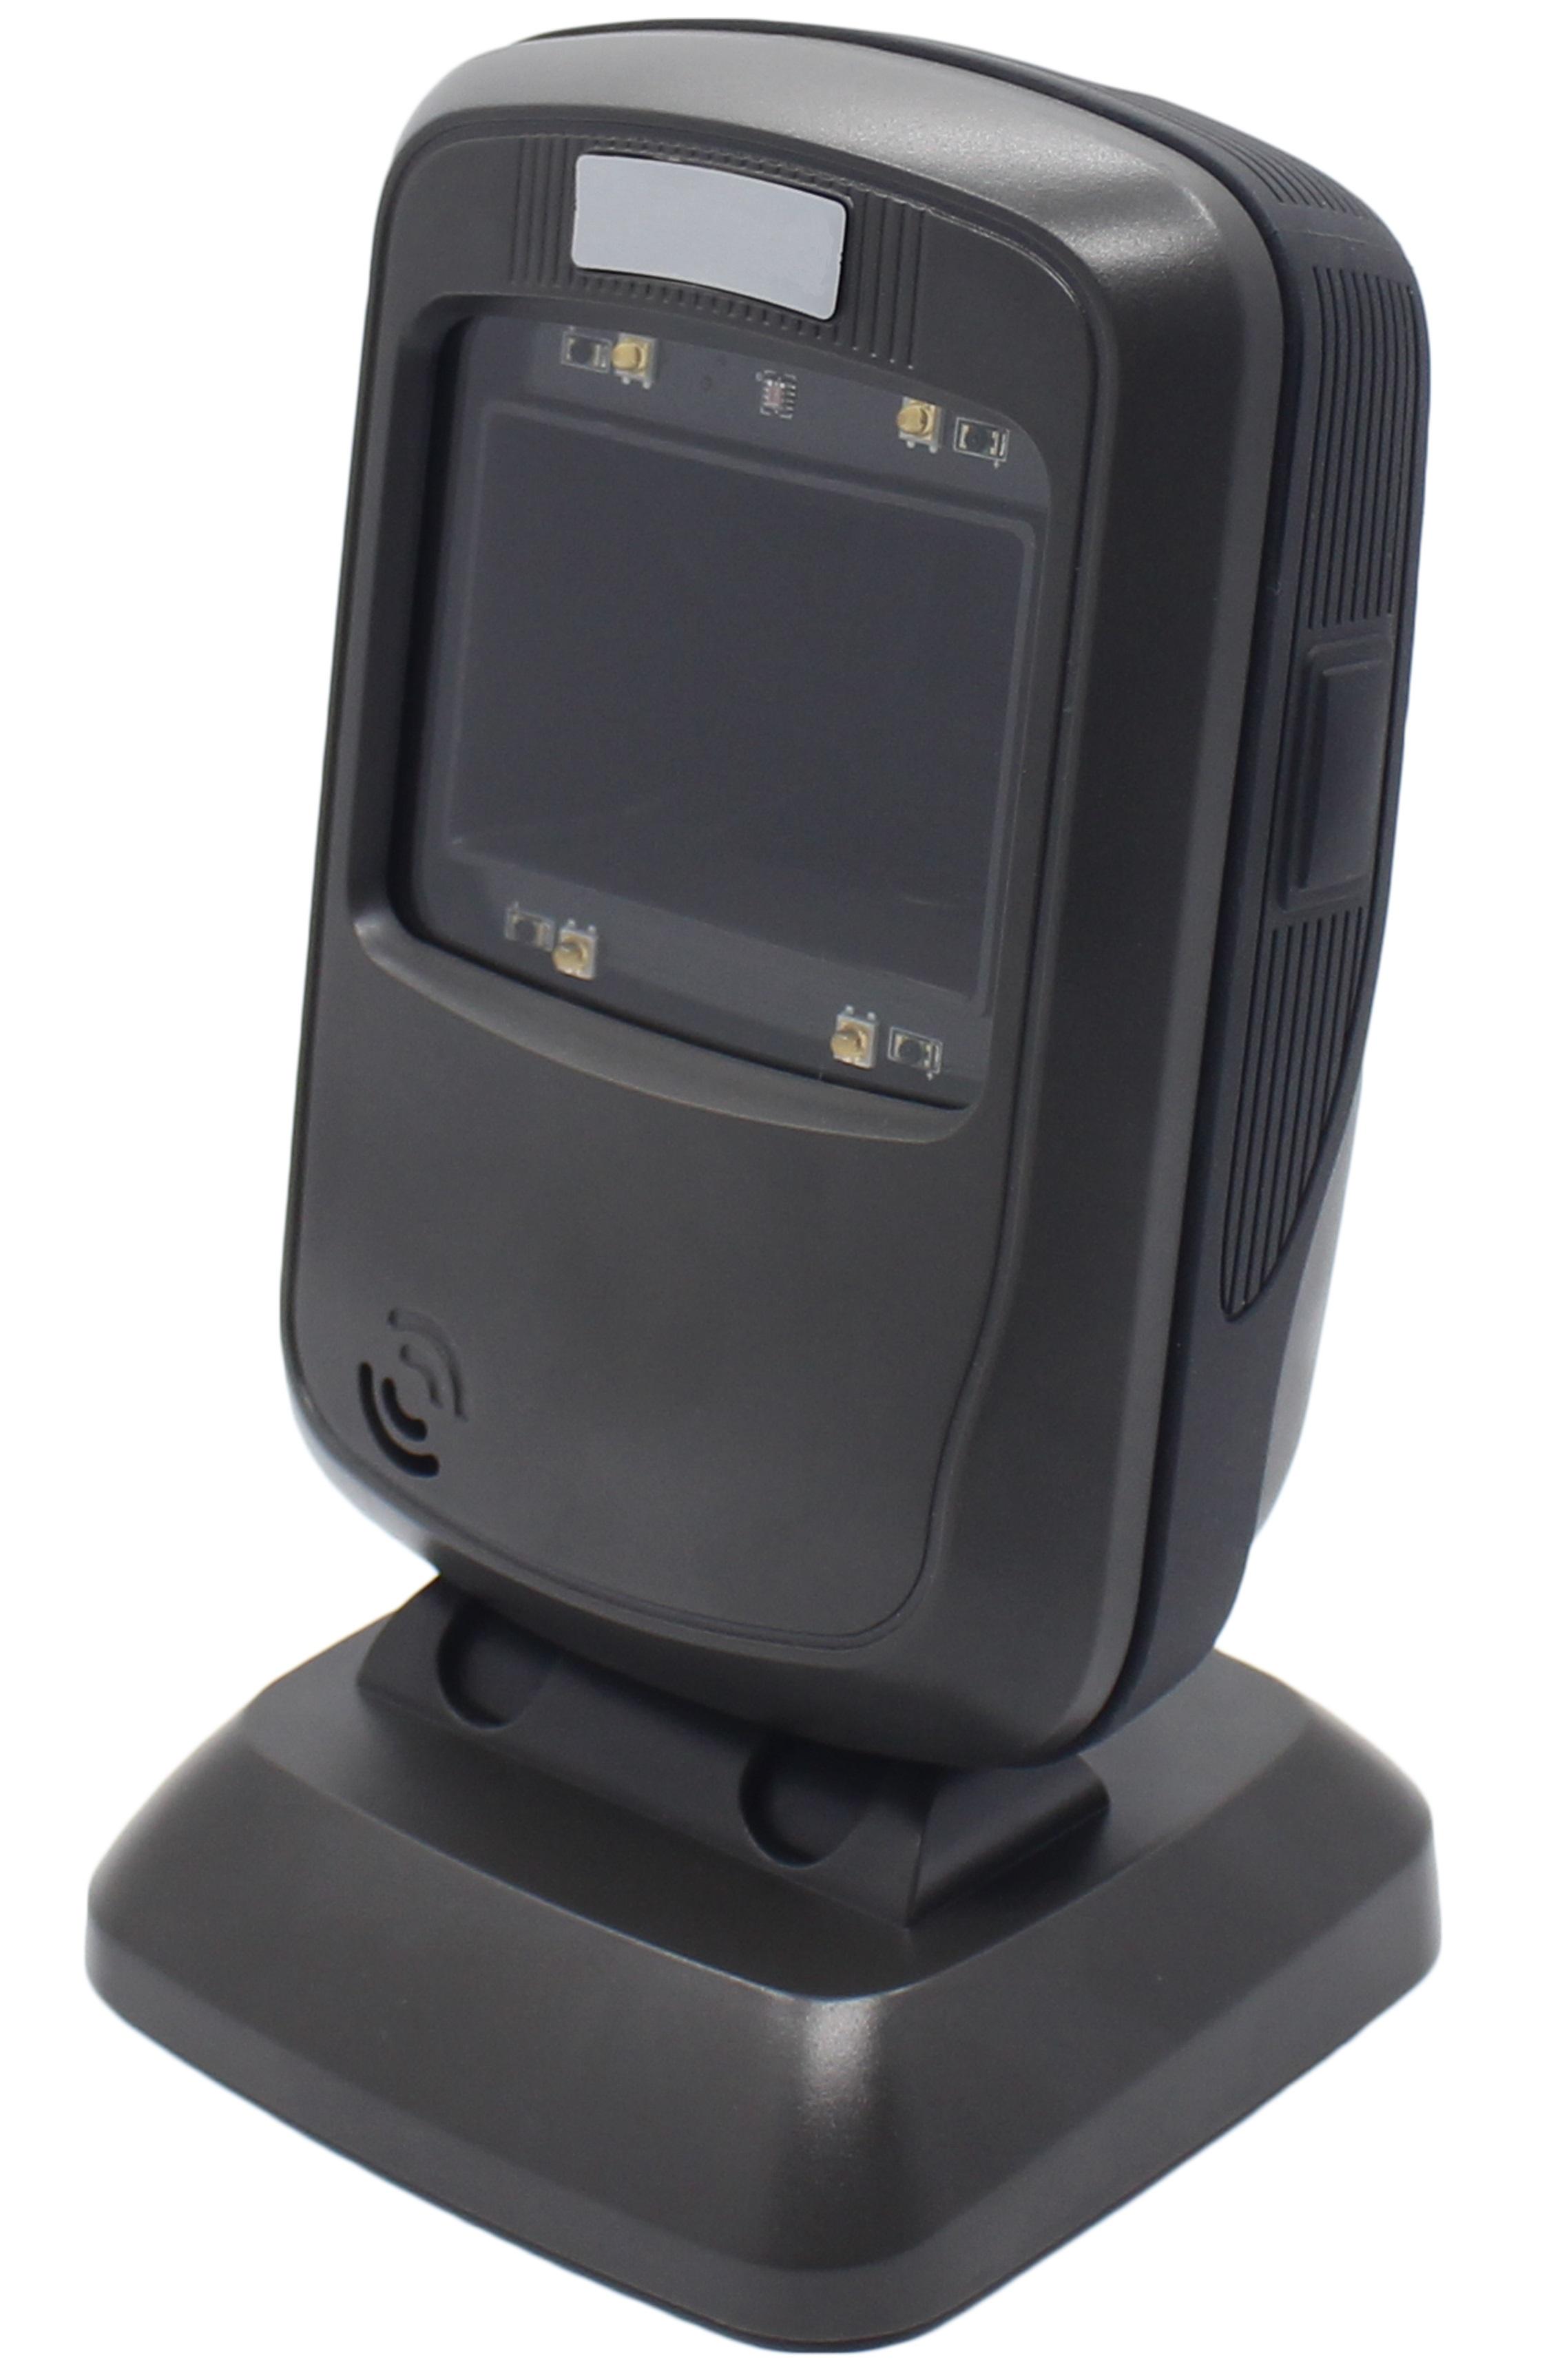 LEITOR SEMI-FIXO EL6200-USB